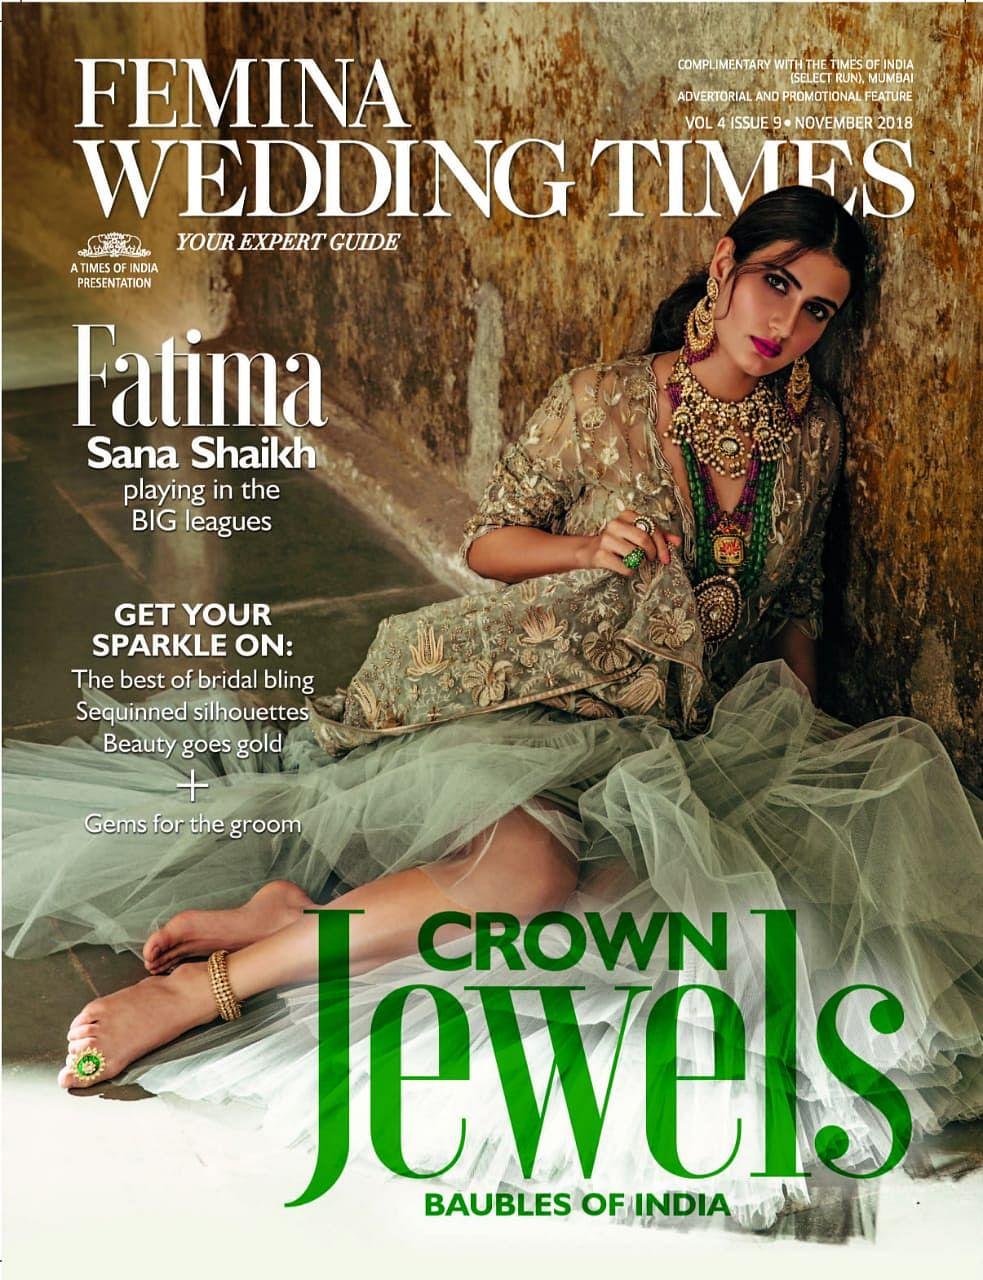 Fatima Sana Shaikh dazzles as a bride on the cover of magazine